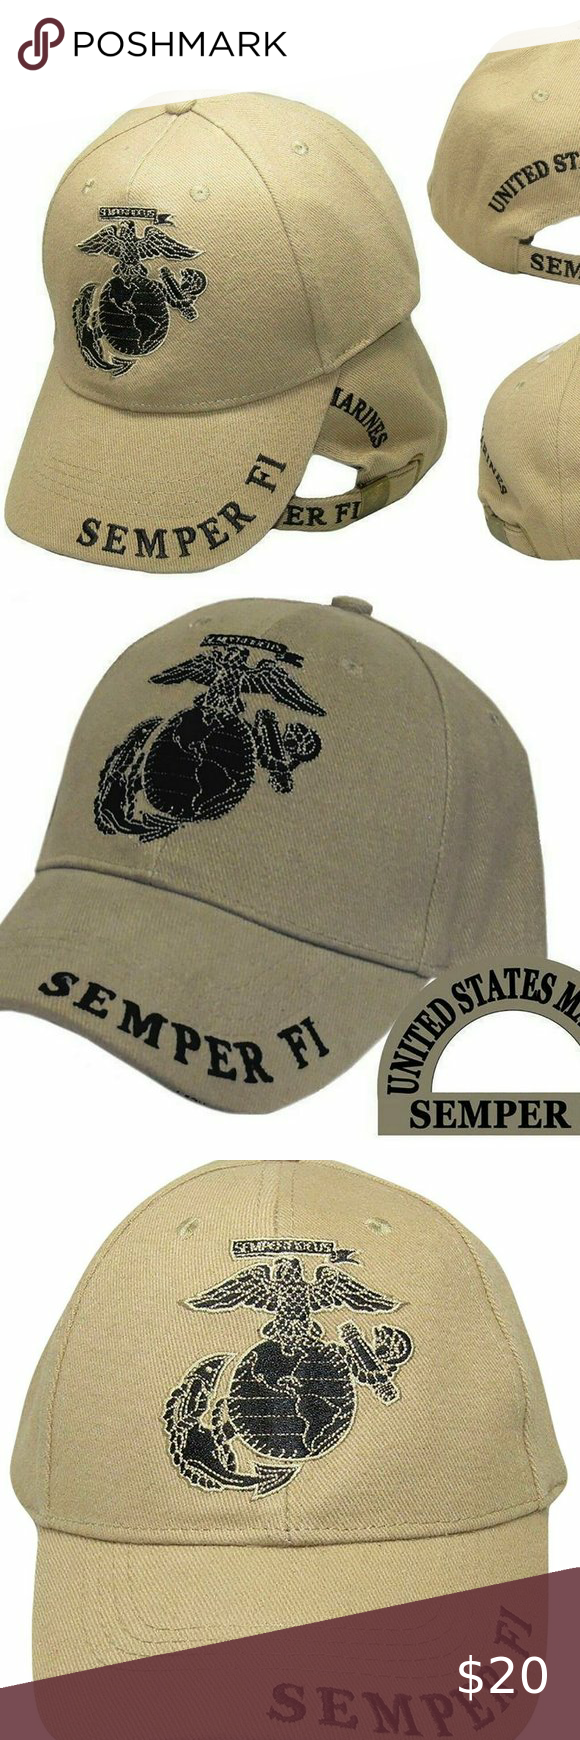 Khaki U.S Marines USMC Marine EGA Logo Eagle Subdued Semper Fi Cap Hat